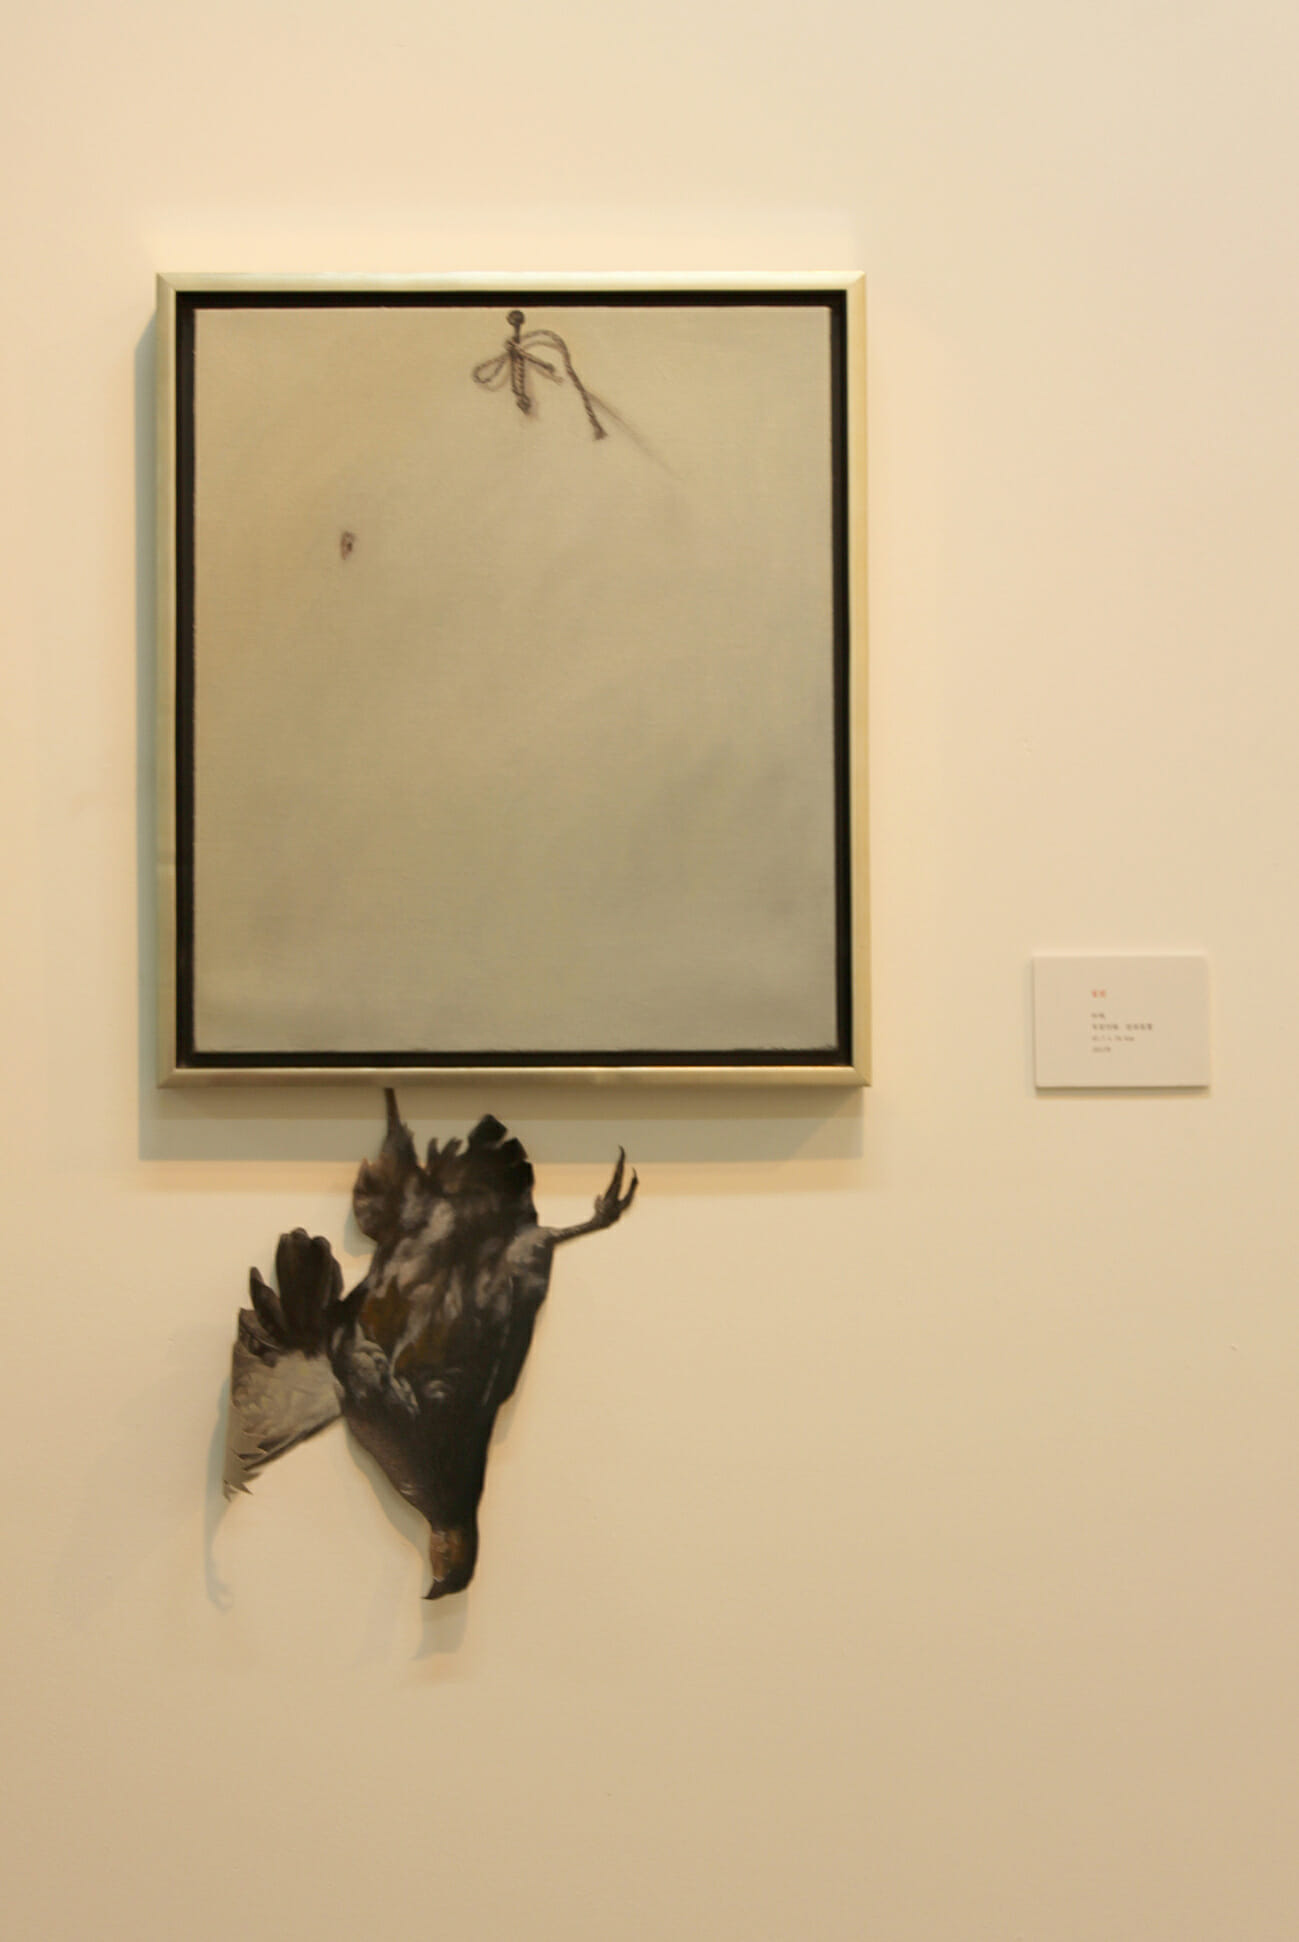 Reformation @ White Rabbit Gallery